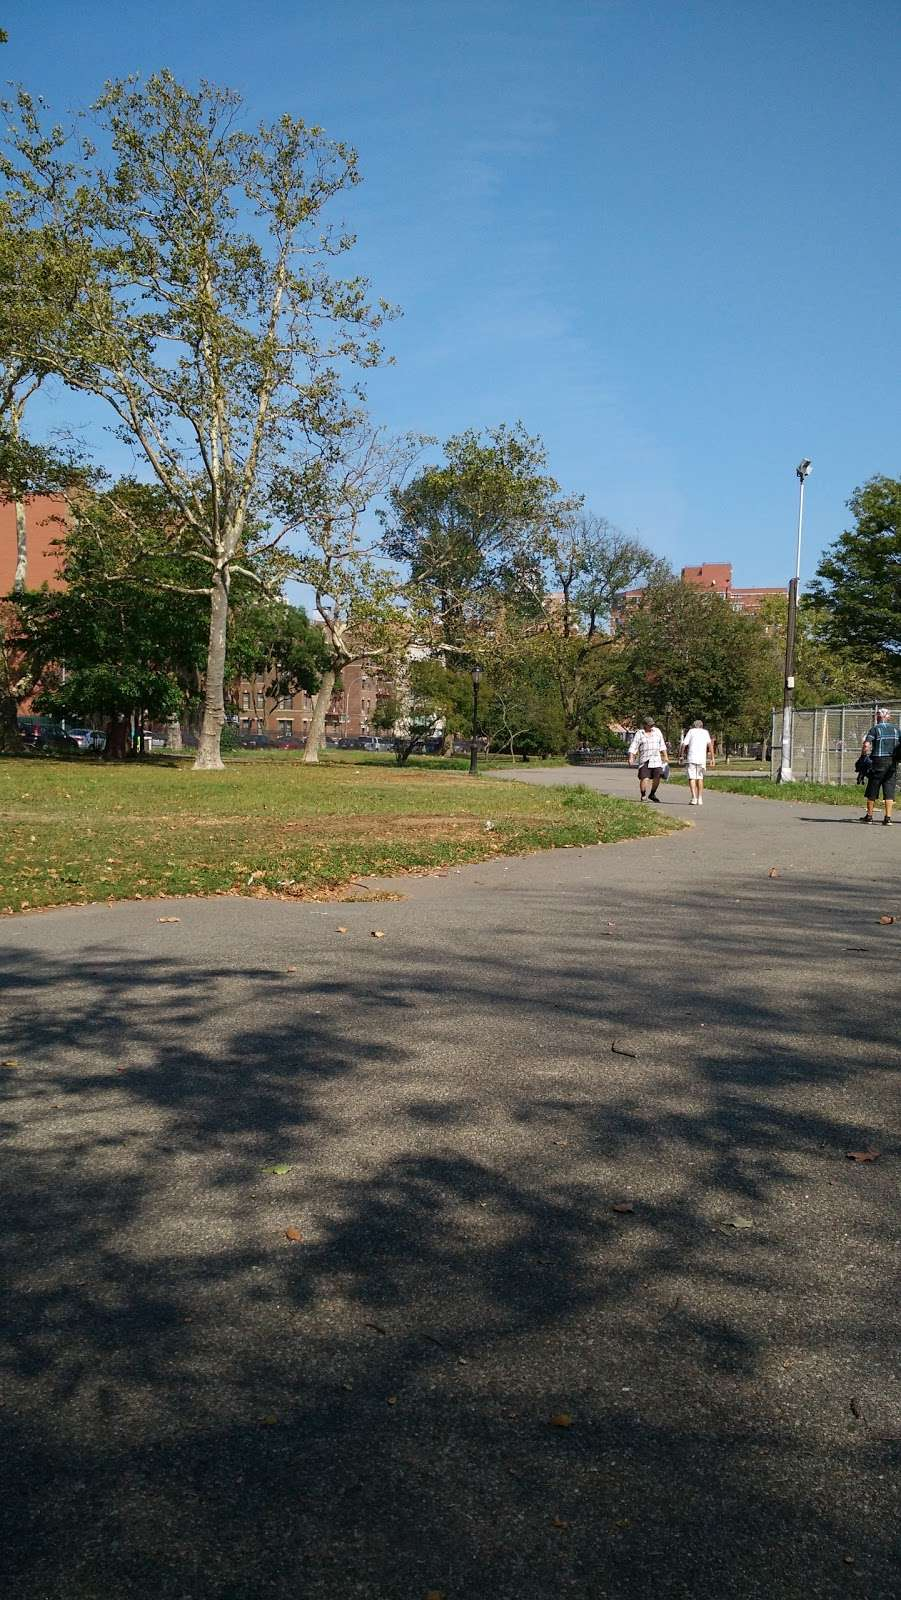 Asser Levy Park - park  | Photo 3 of 10 | Address: 302 Sea Breeze Ave, Brooklyn, NY 11224, USA | Phone: (212) 639-9675